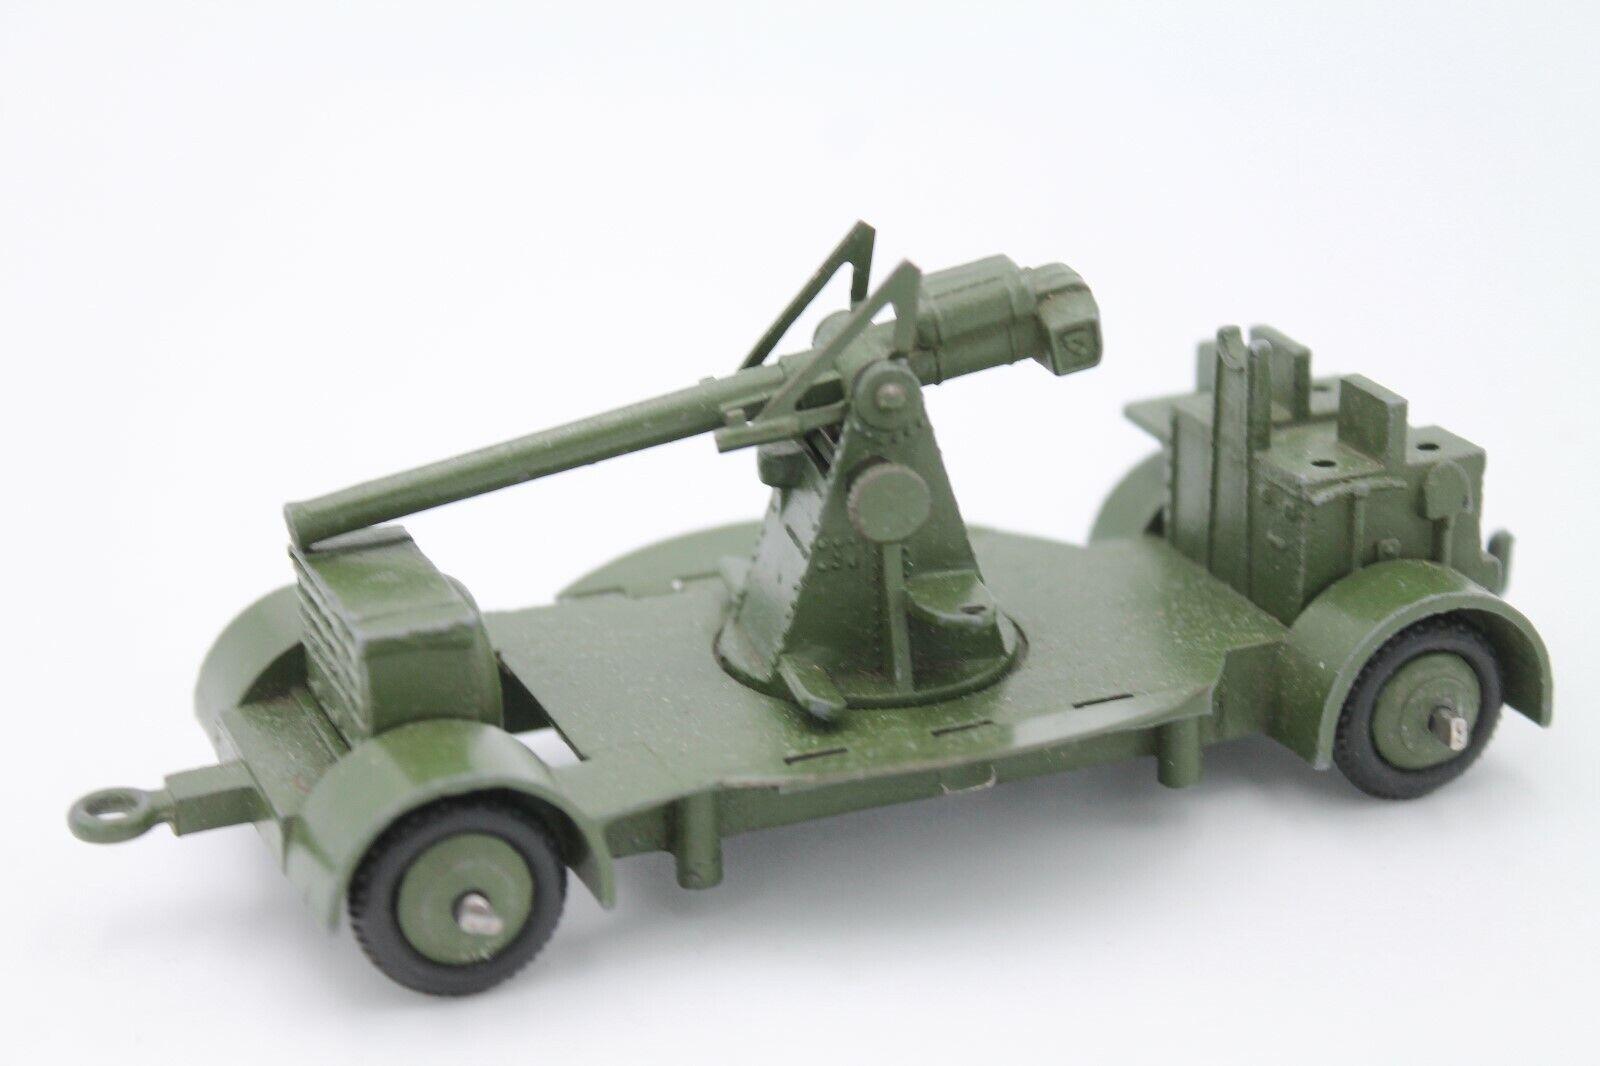 DINKY SpielzeugS 161  ANTI AIRCRAFT GUN   ORIGINAL MECCANO  PREWAR